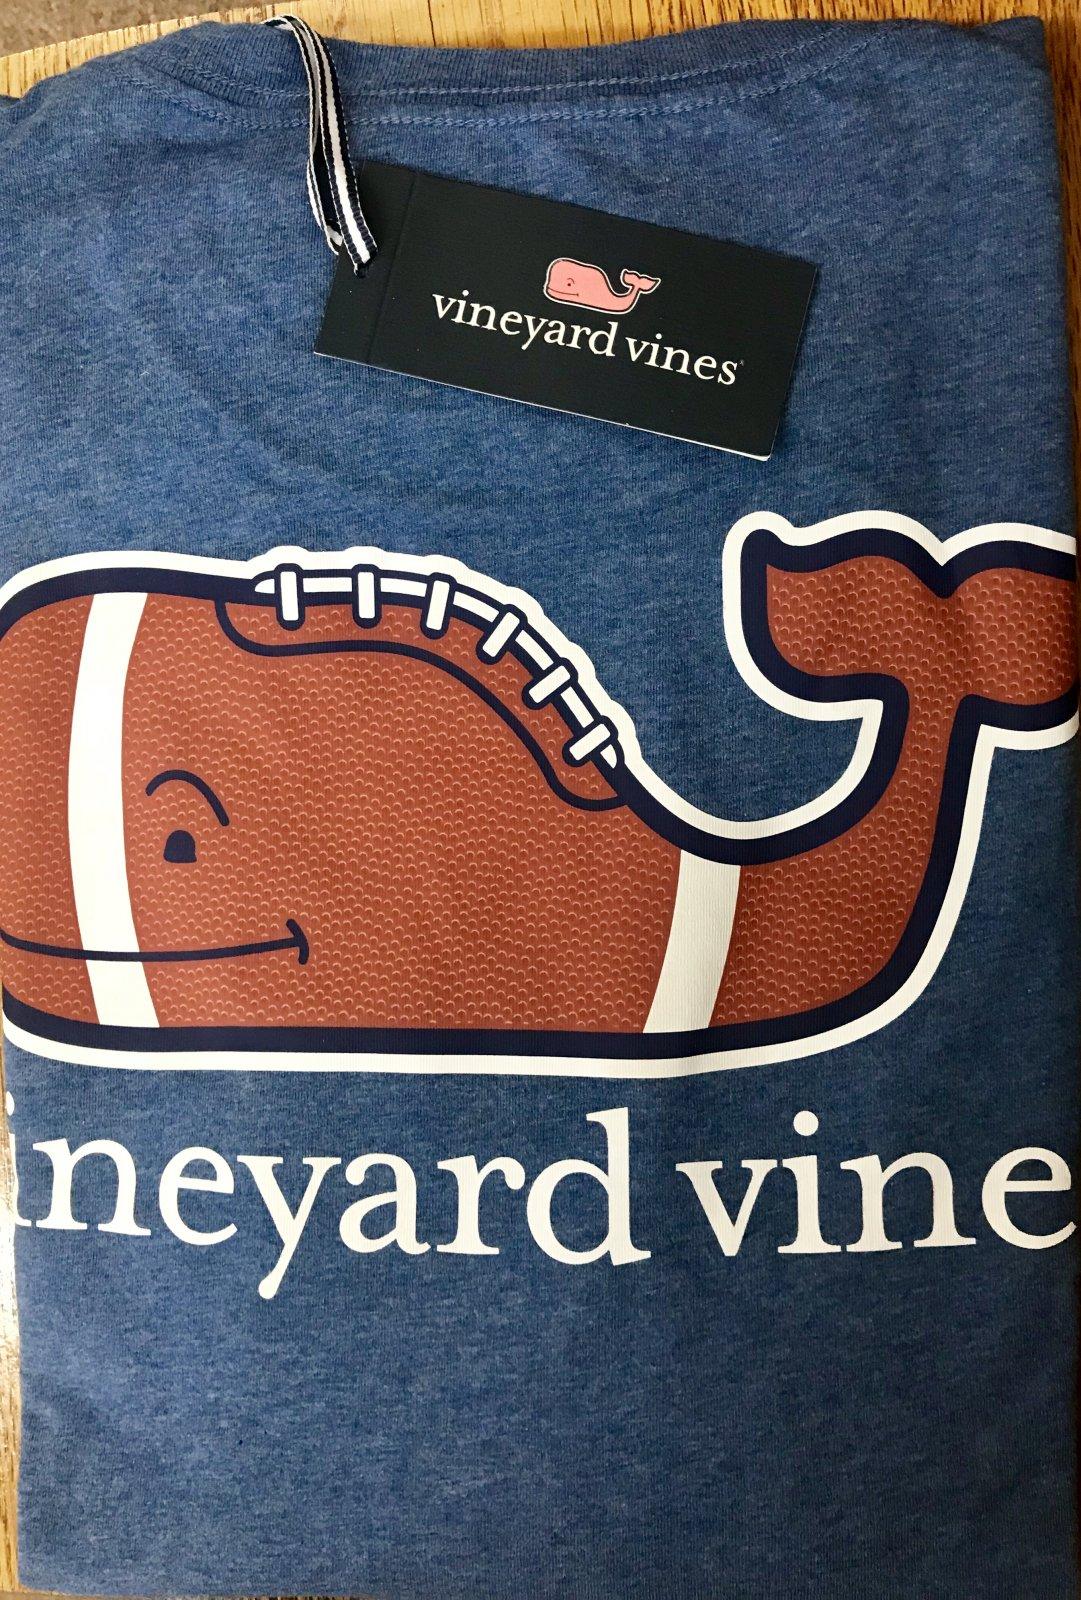 Vineyard Vines LS HTHRD Football WHLE Pkt T